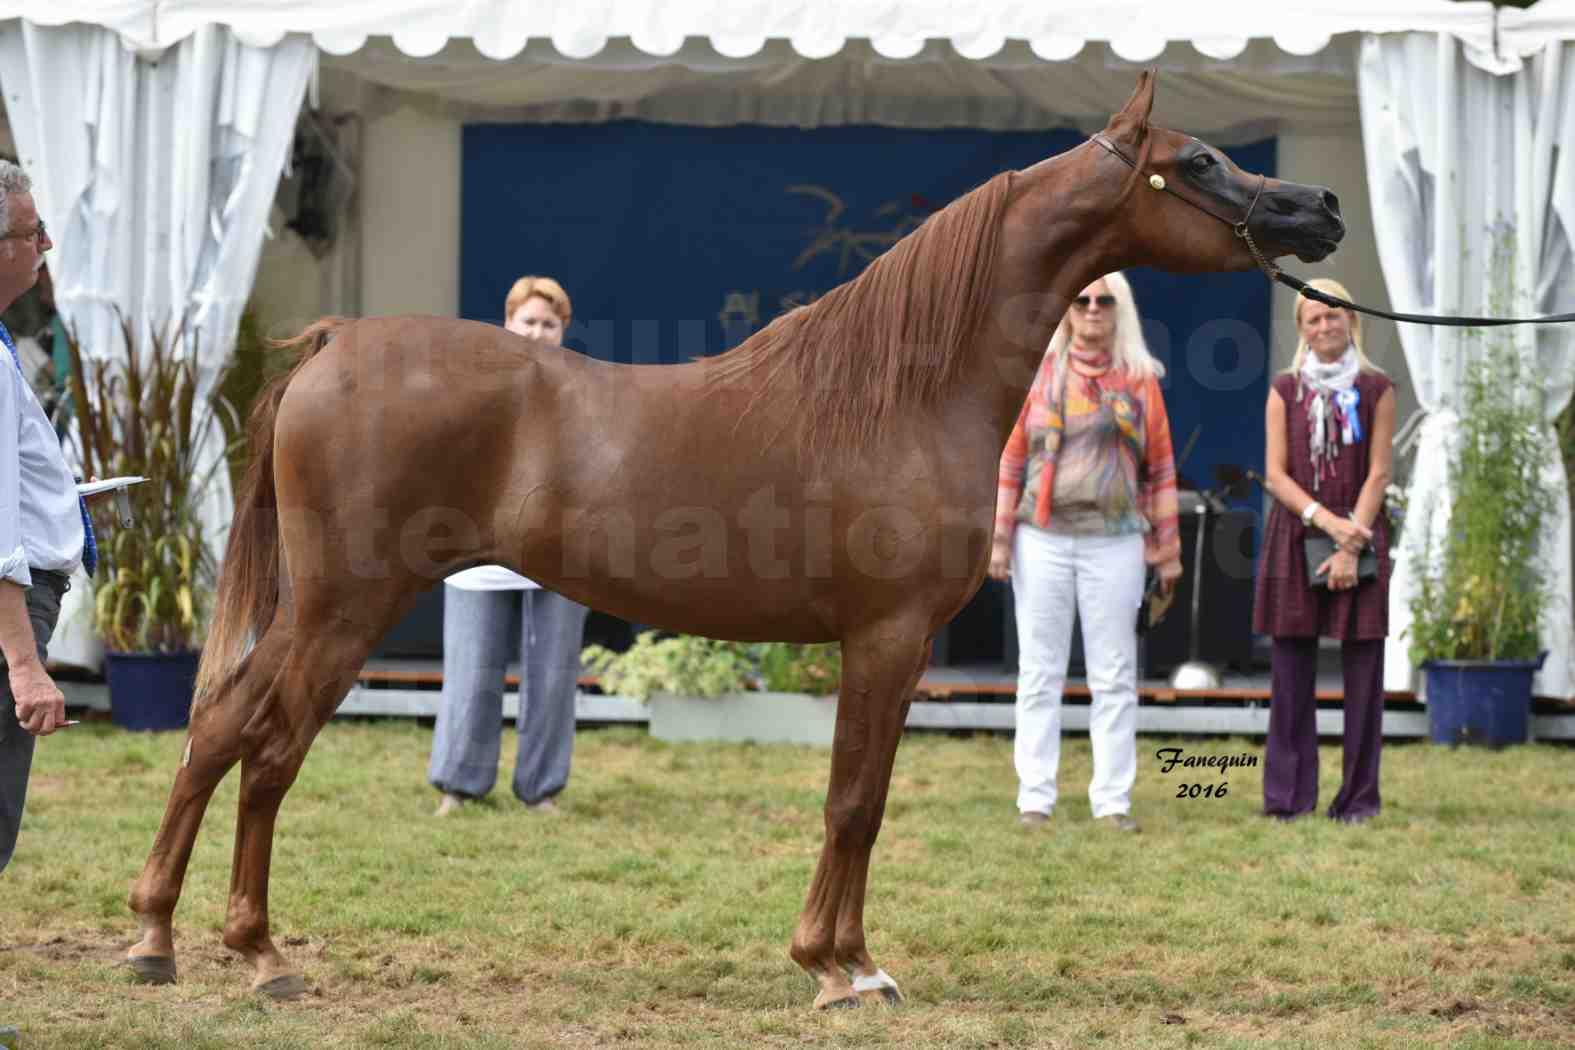 International Arabian Horse Show B de VICHY 2016 - PEARL DE DJOON - Notre Sélection - 41